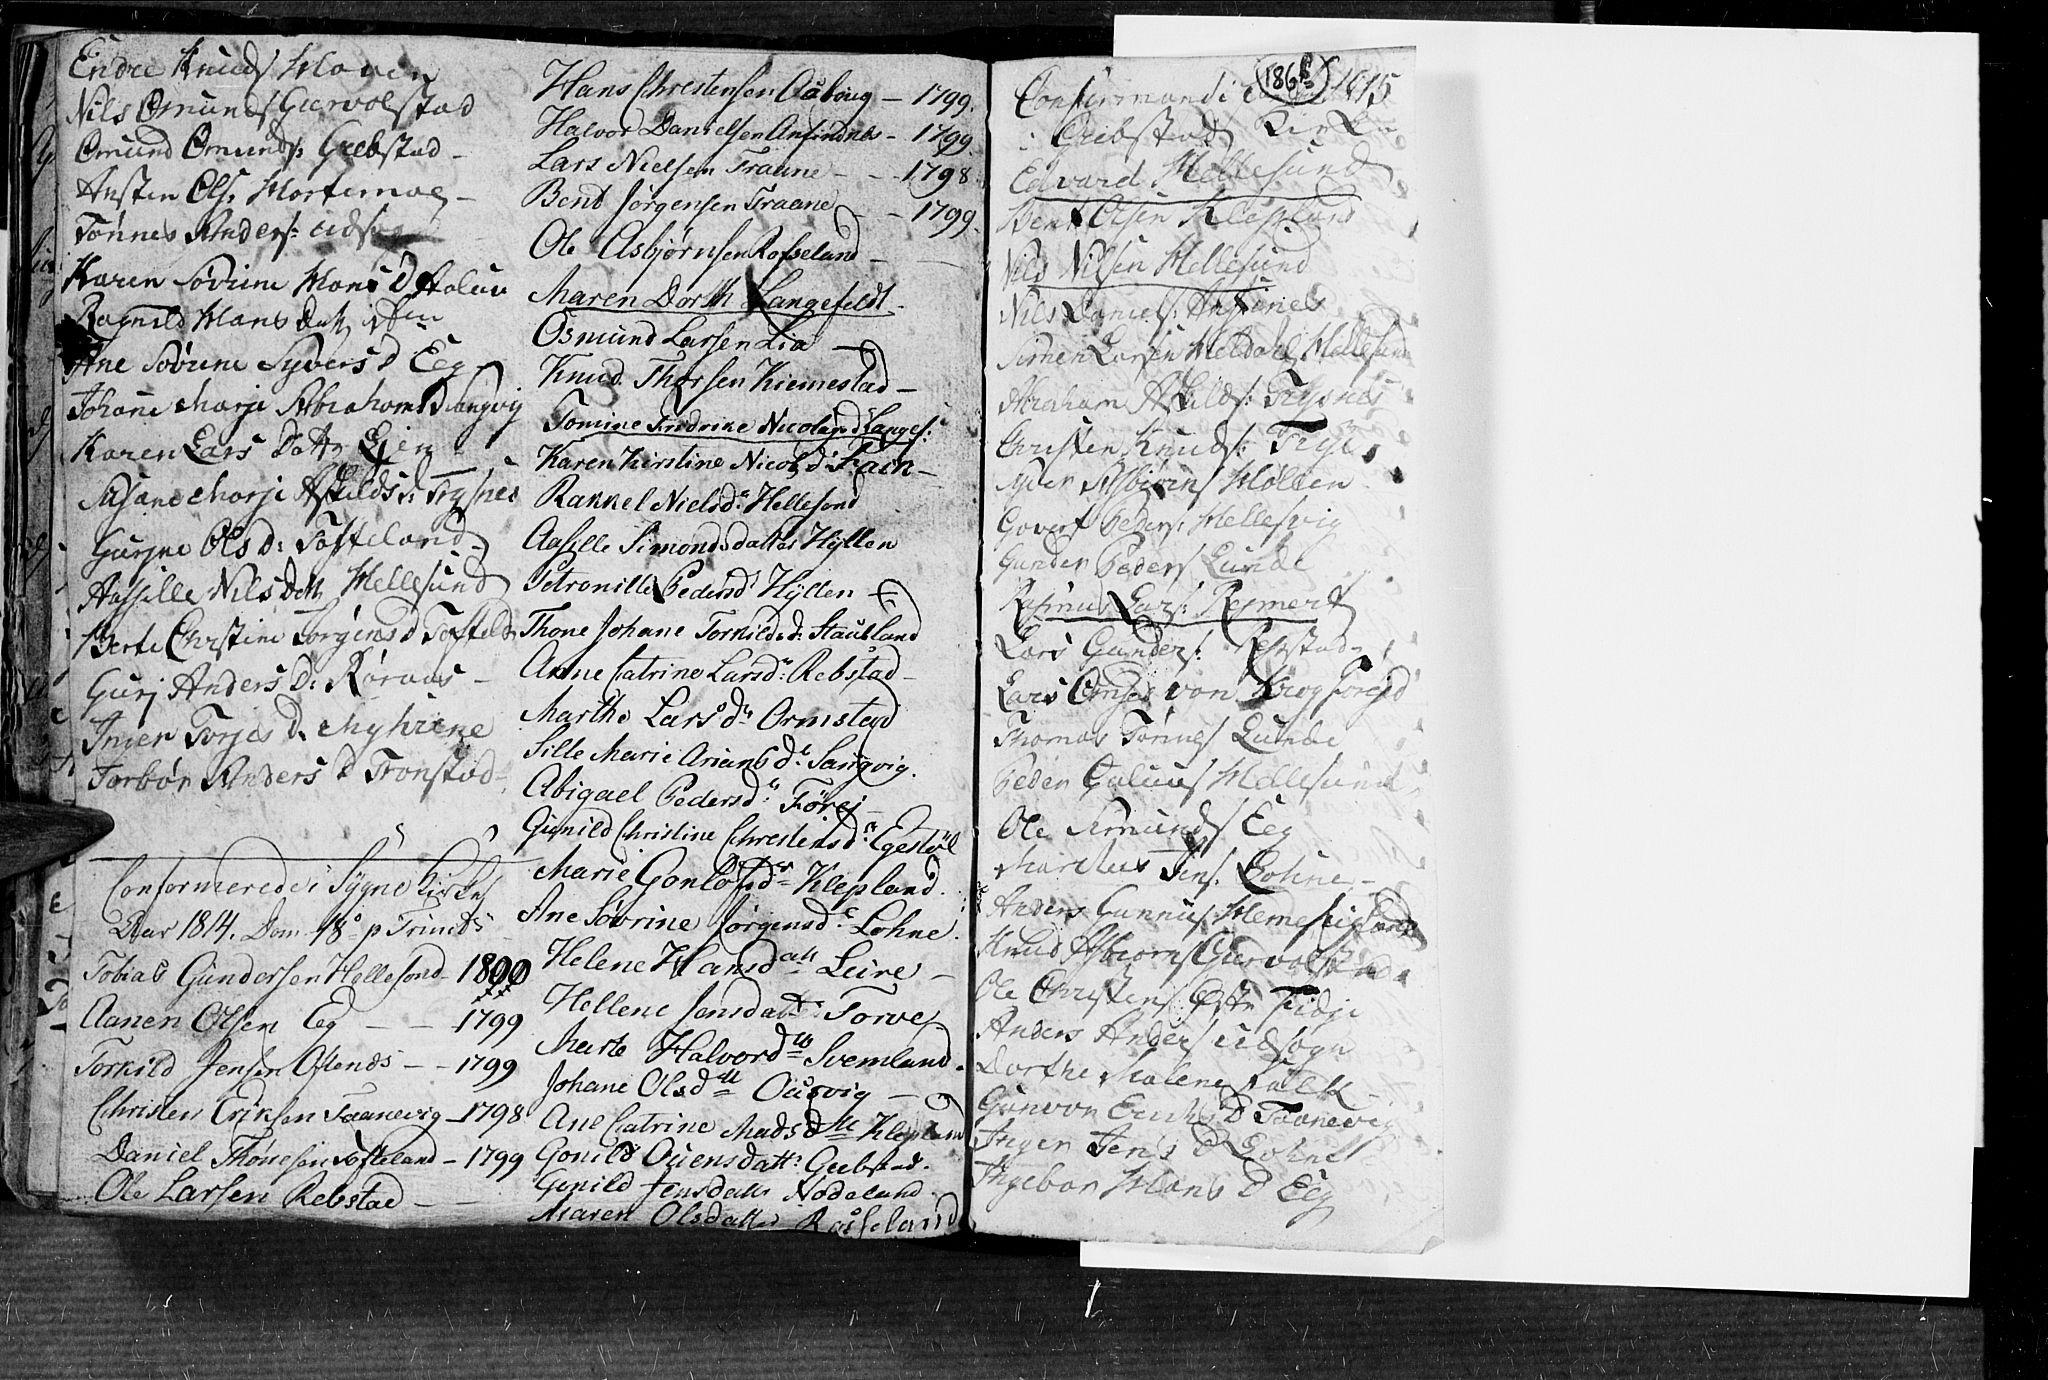 SAK, Søgne sokneprestkontor, F/Fa/Fab/L0004: Ministerialbok nr. A 4, 1770-1822, s. 186-187